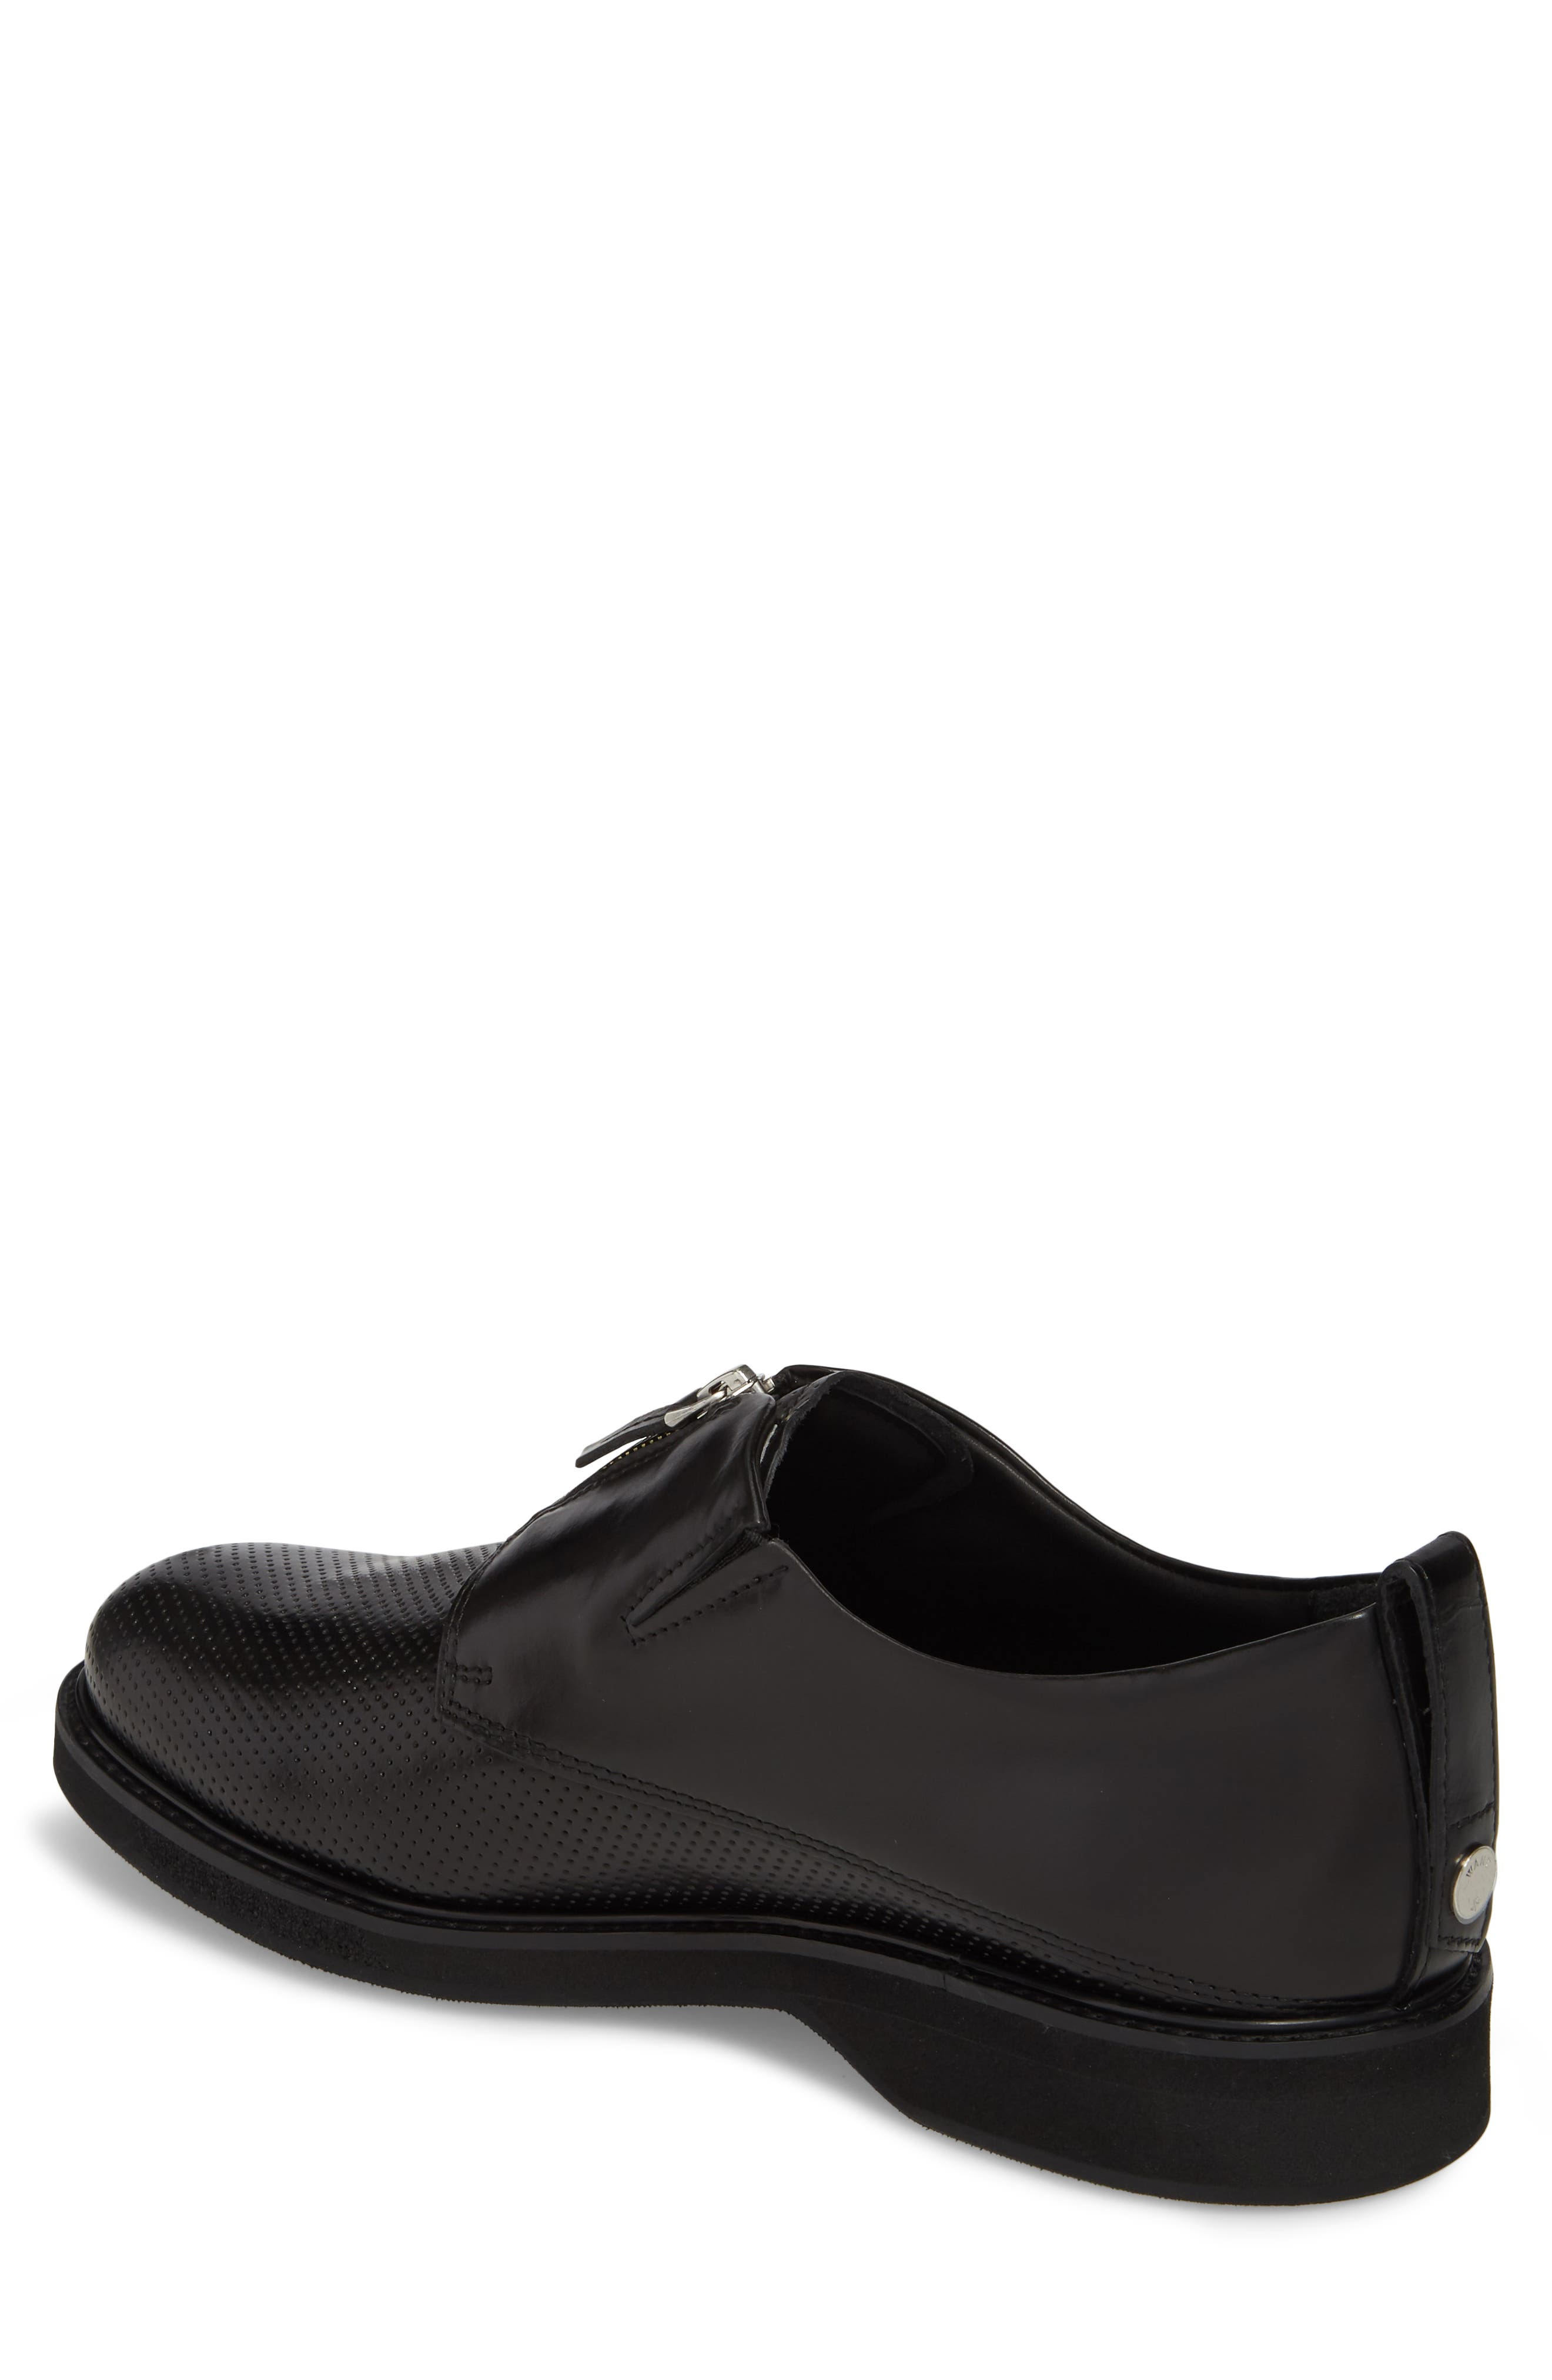 Zipped Derby Shoe,                             Alternate thumbnail 2, color,                             Multi Perforated Black/ Black